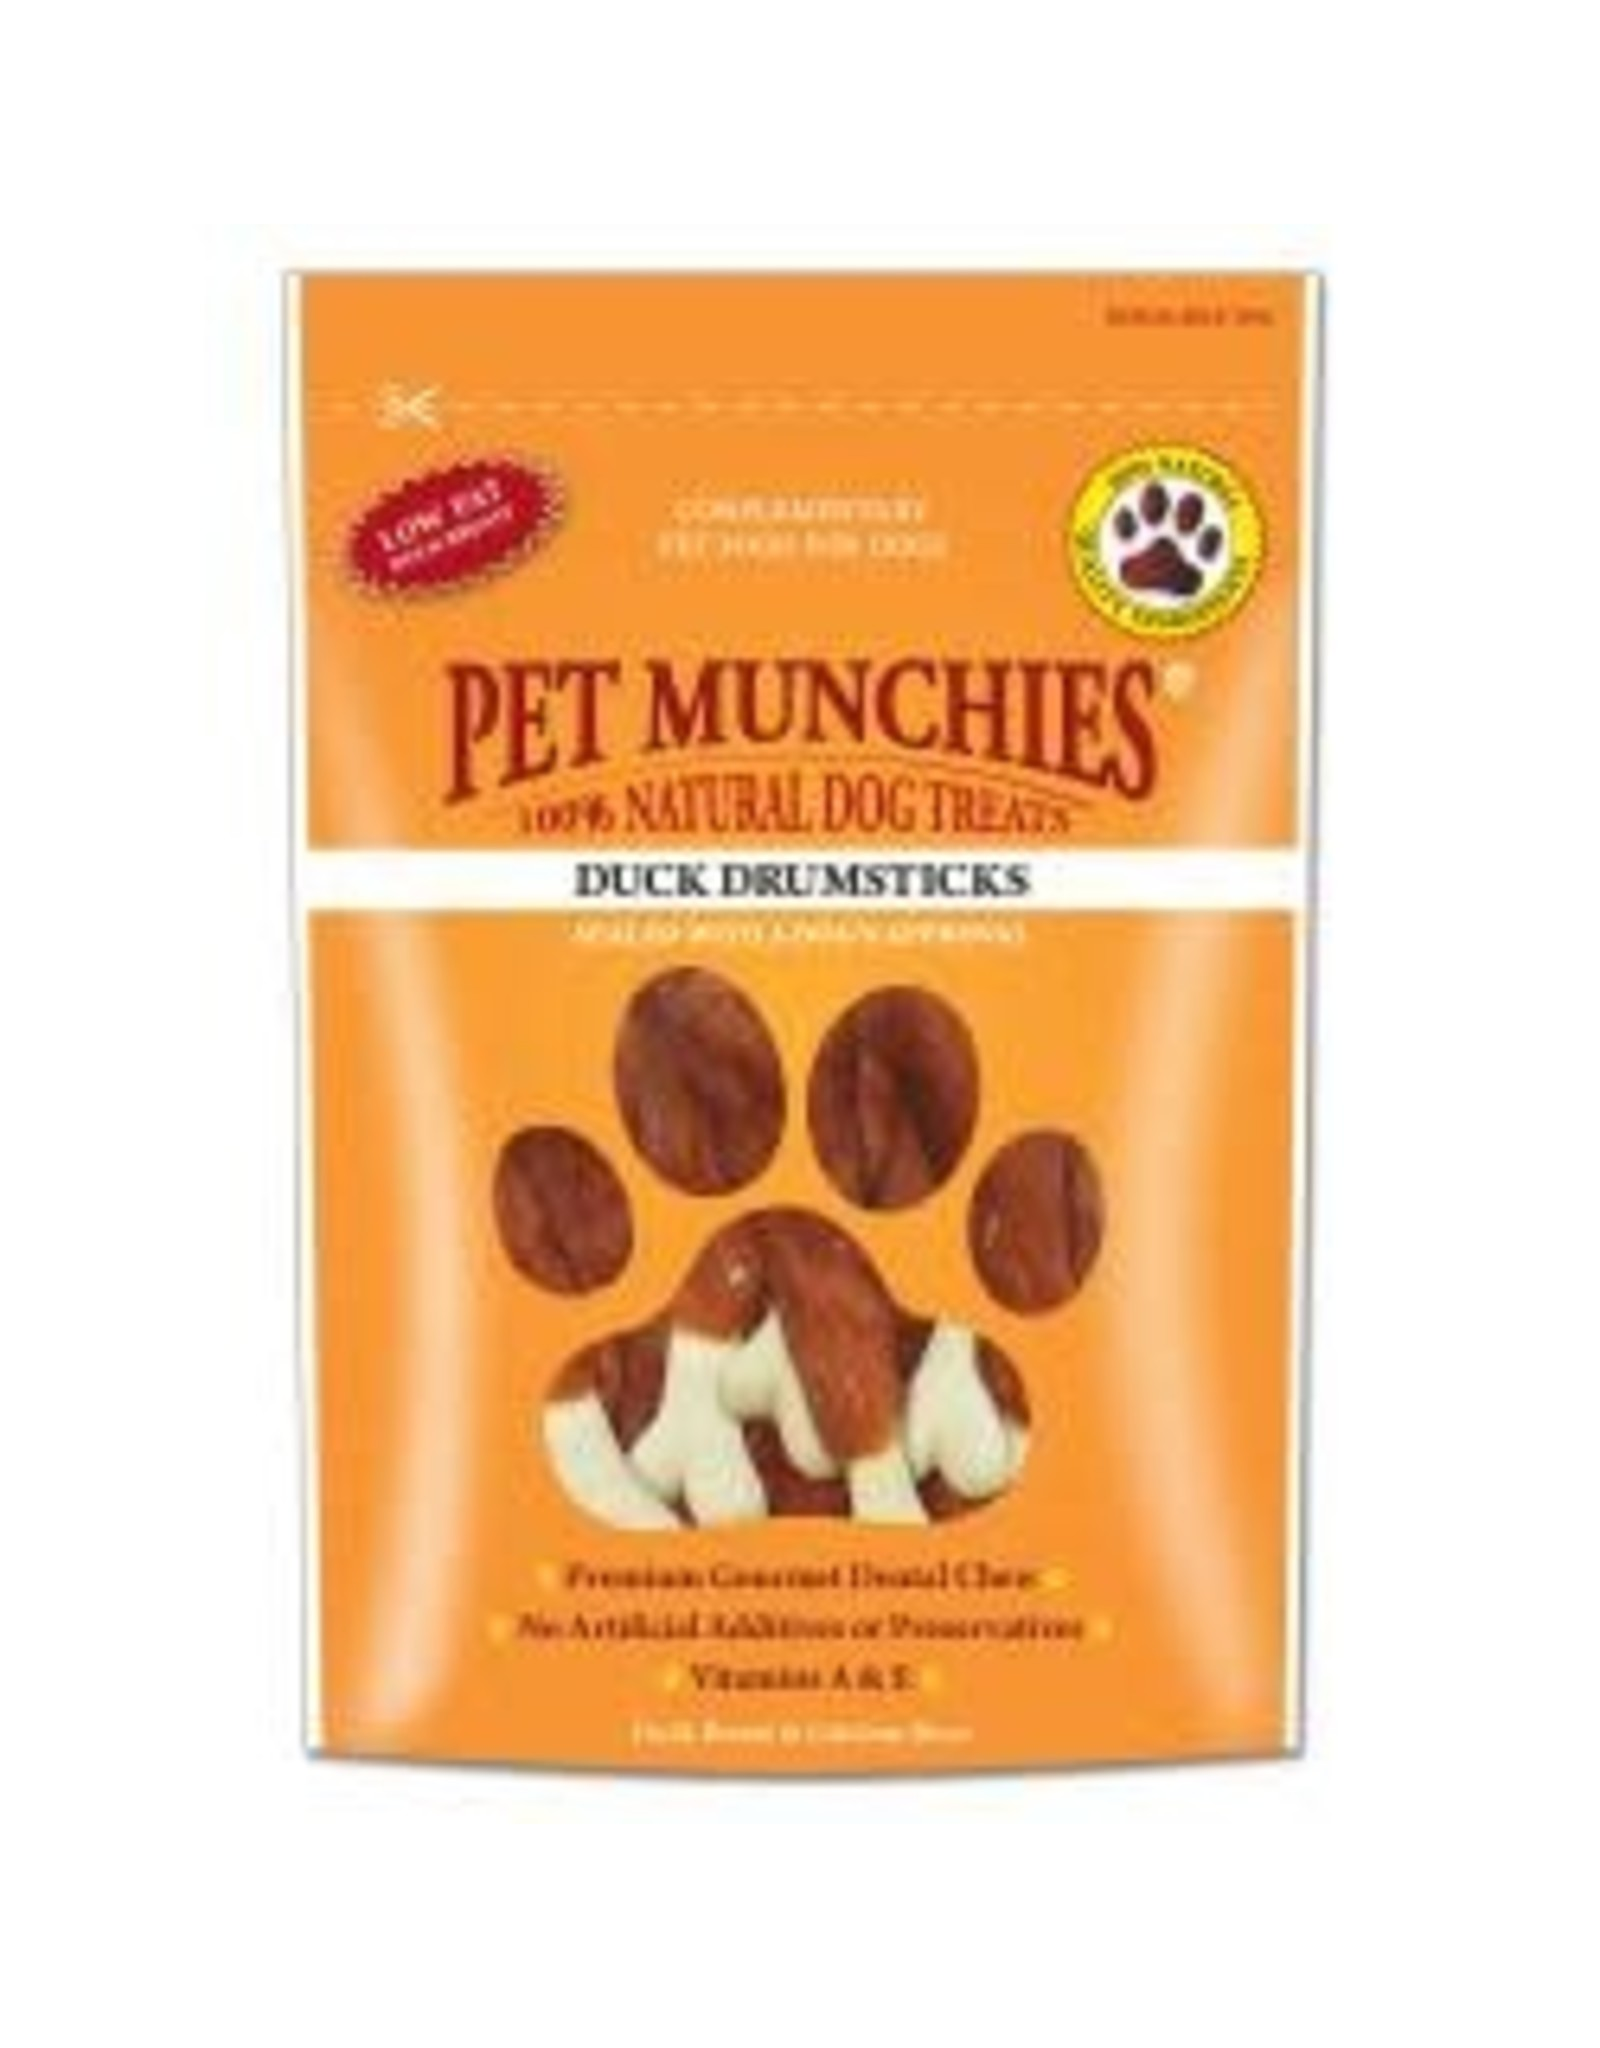 Pet Munchies Pet Munchies Duck Drumsticks 100g